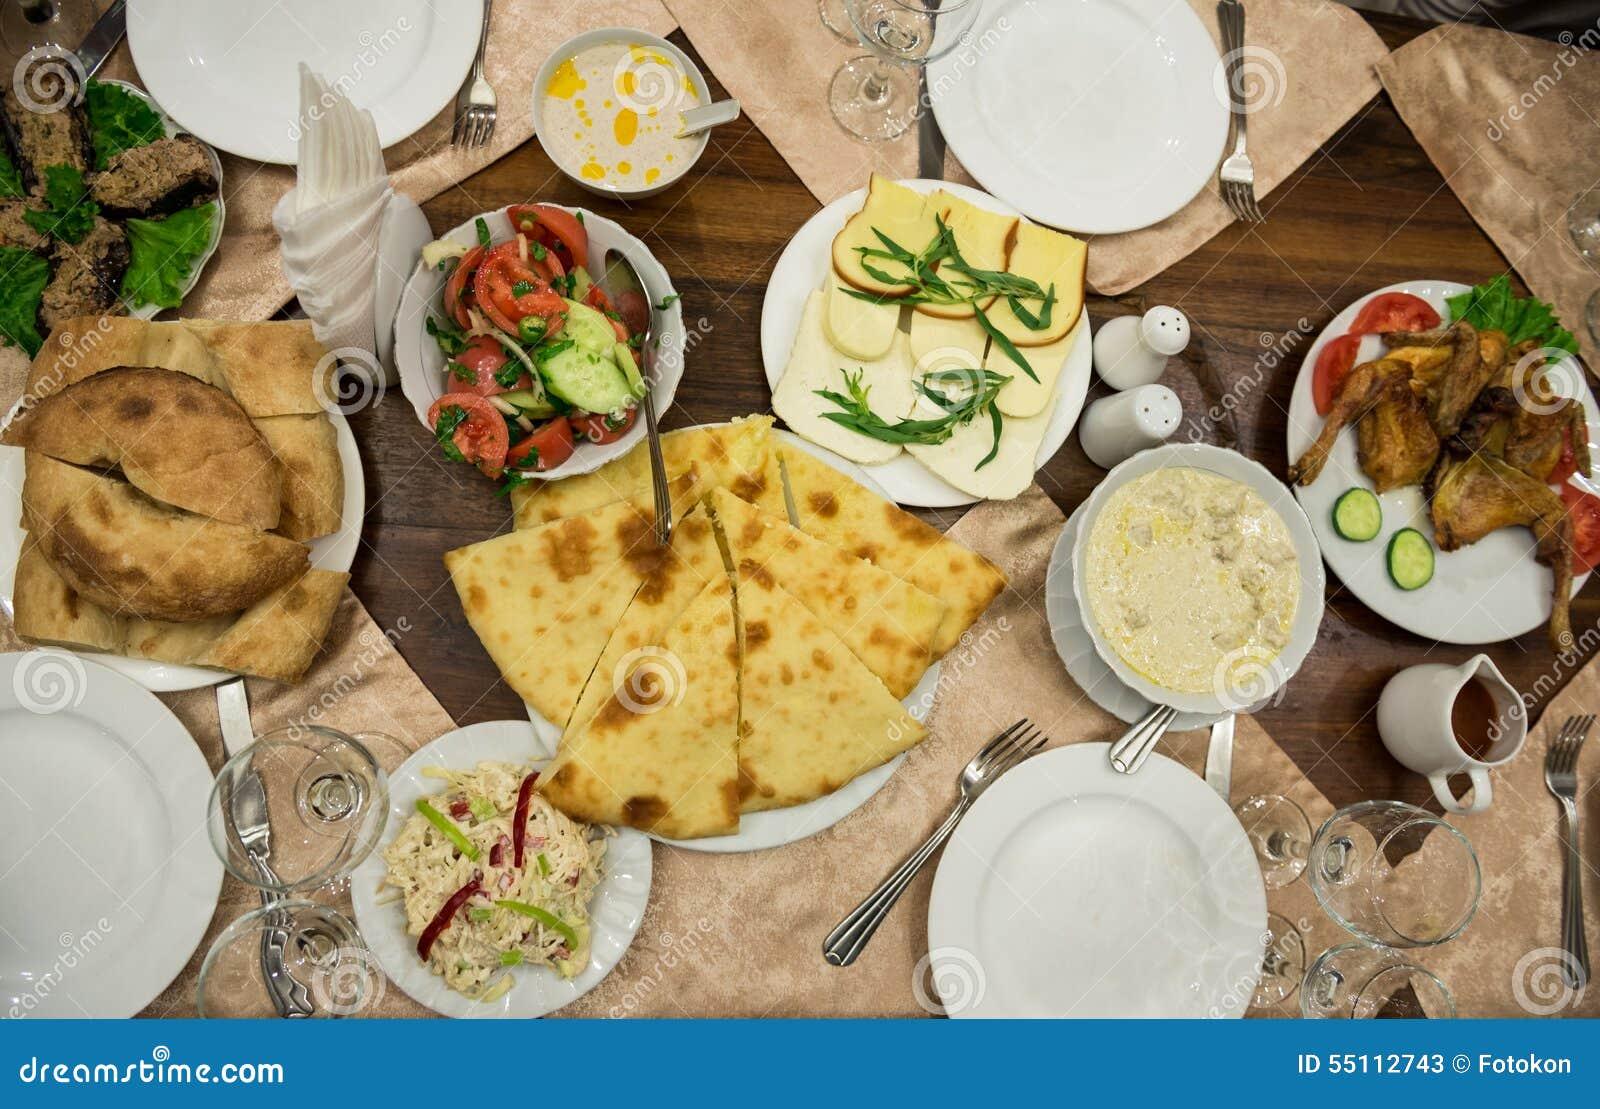 Alimento georgiano